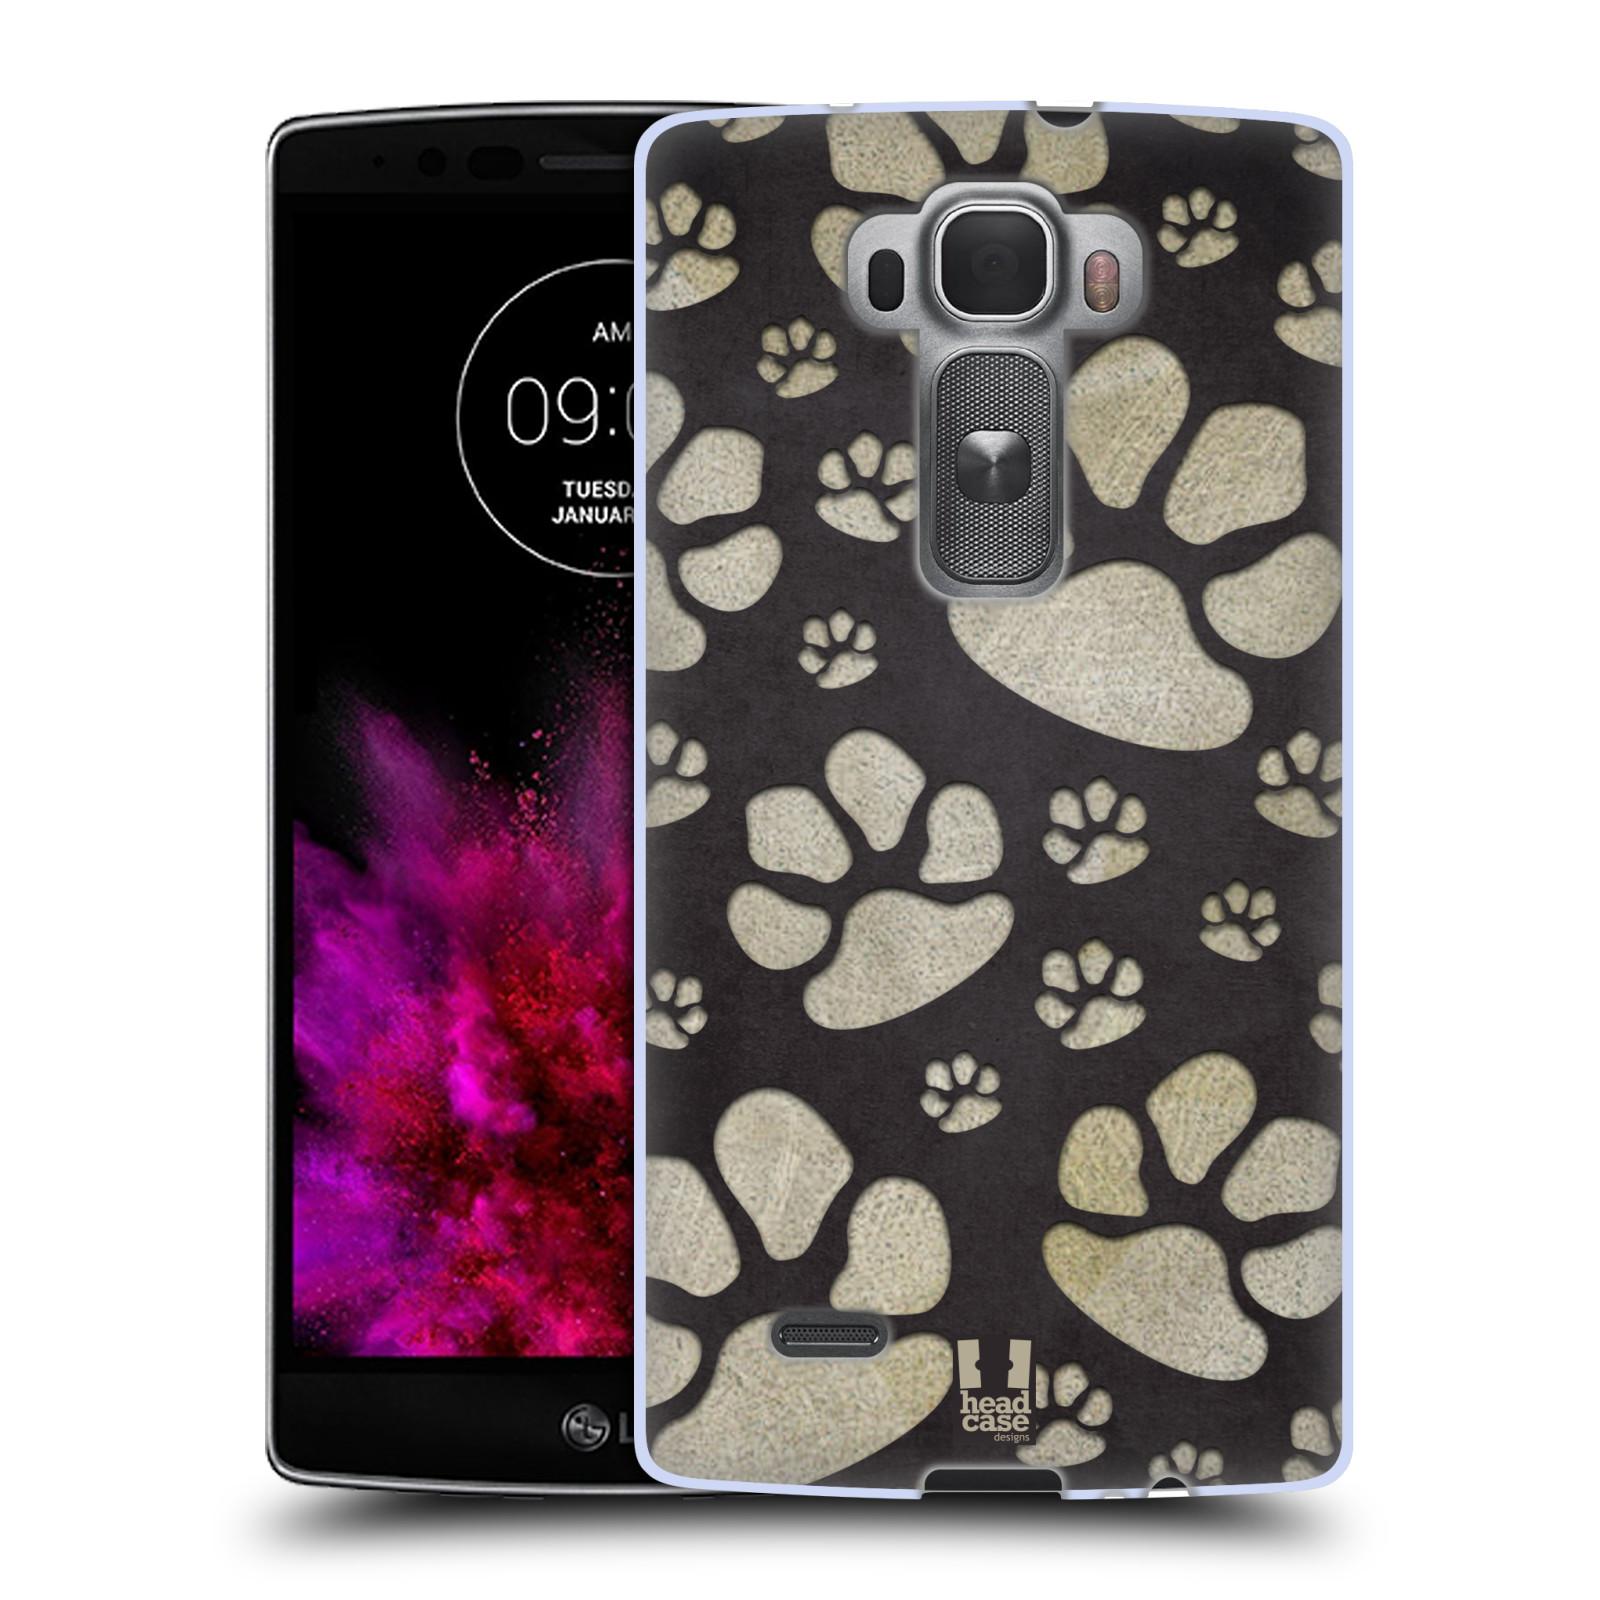 Silikonové pouzdro na mobil LG G Flex 2 HEAD CASE TLAPKY ŠEDÉ (Silikonový kryt či obal na mobilní telefon LG G Flex 2 H955)